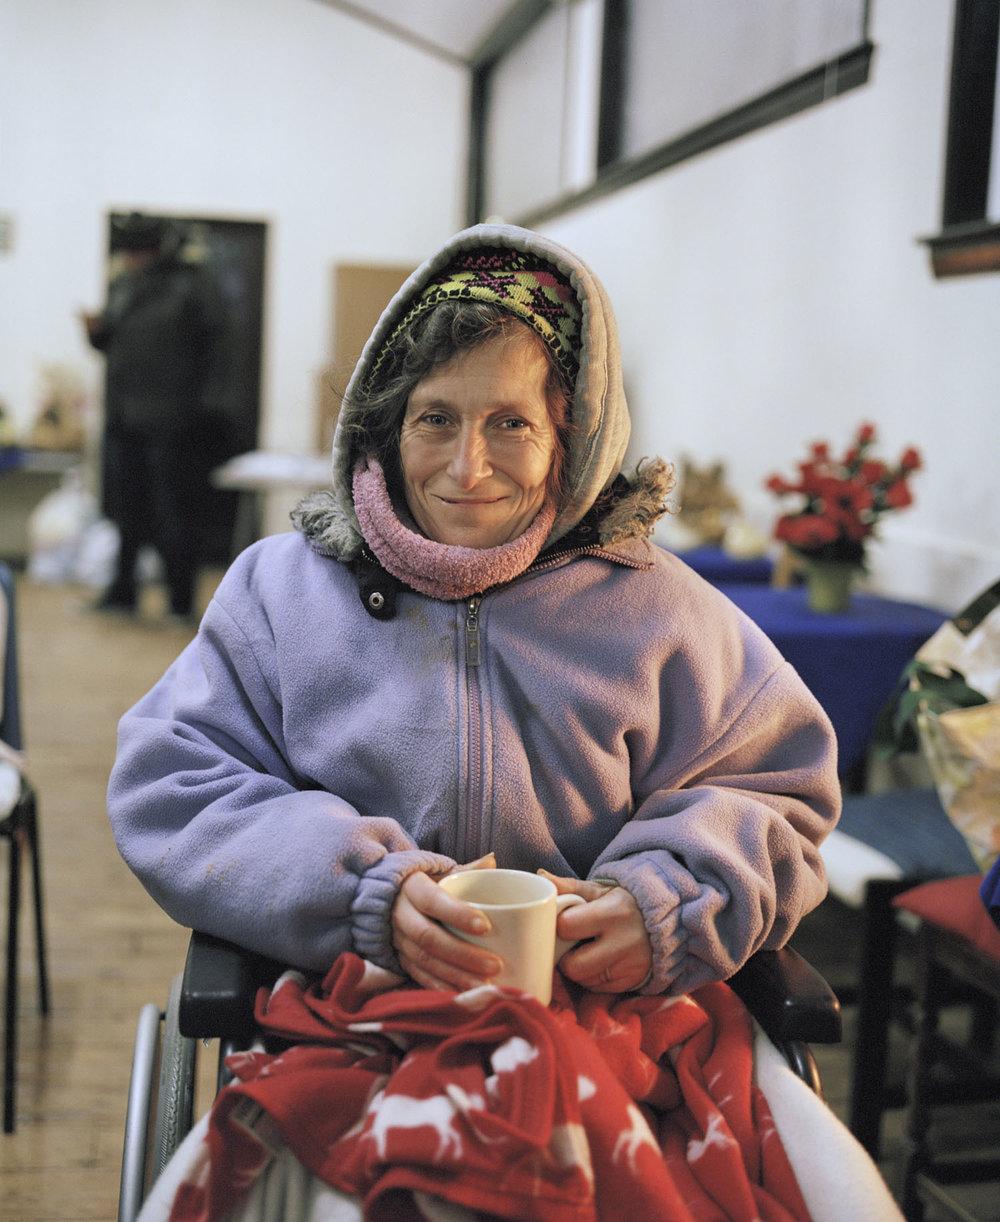 Sandra Mickiewicz Happy Club stabled women sat in wheelchair in village hall drinking tea